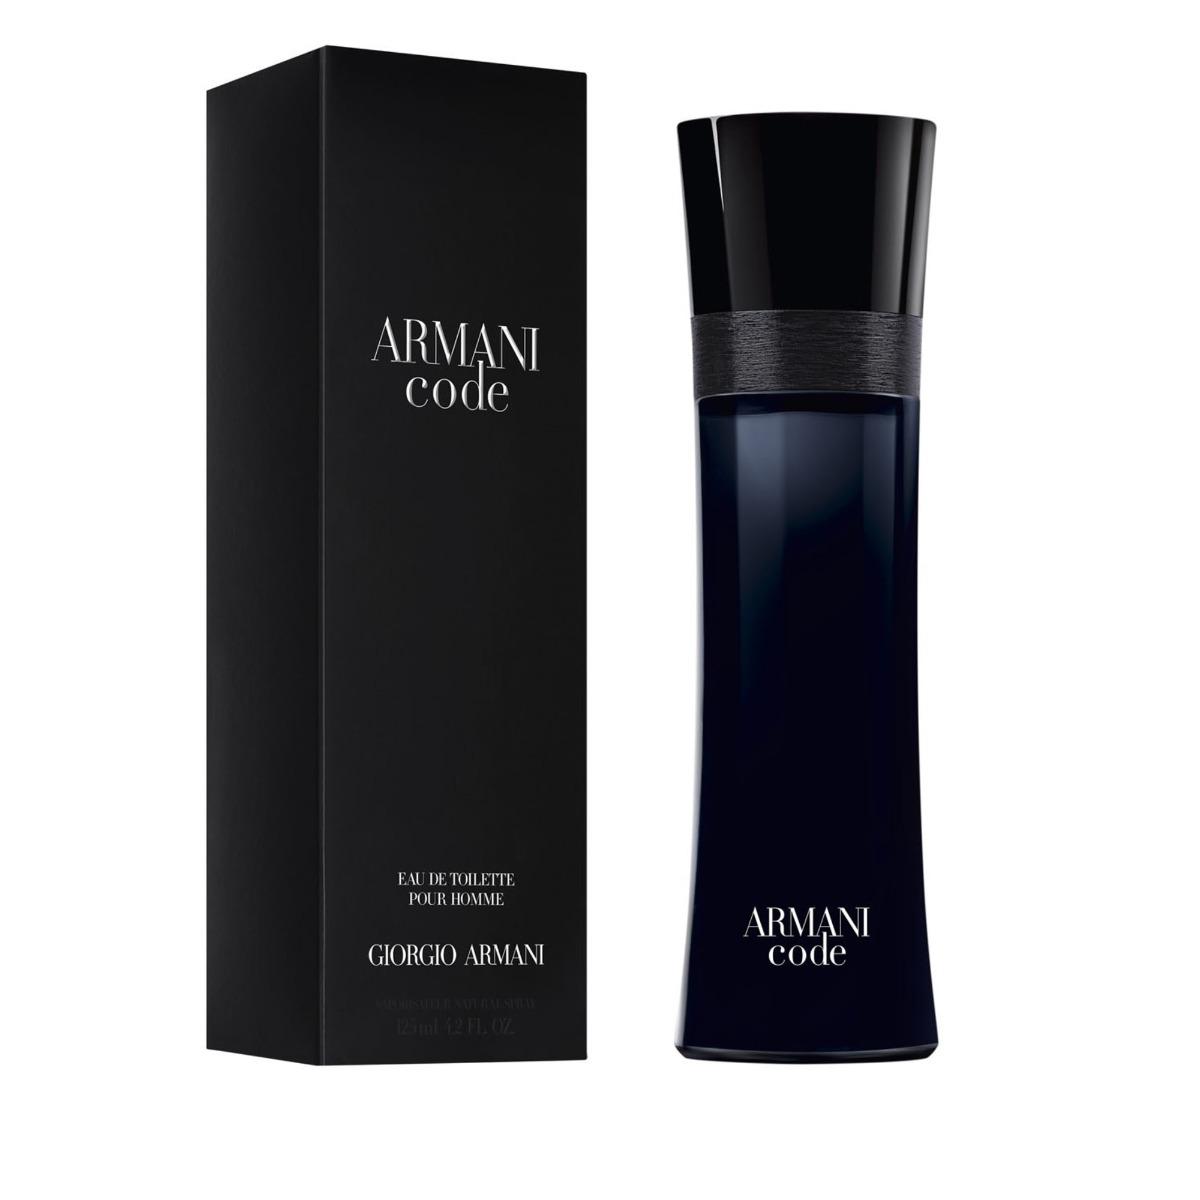 ARMANI CODE FOR MEN EDT SPRAY - 125ML